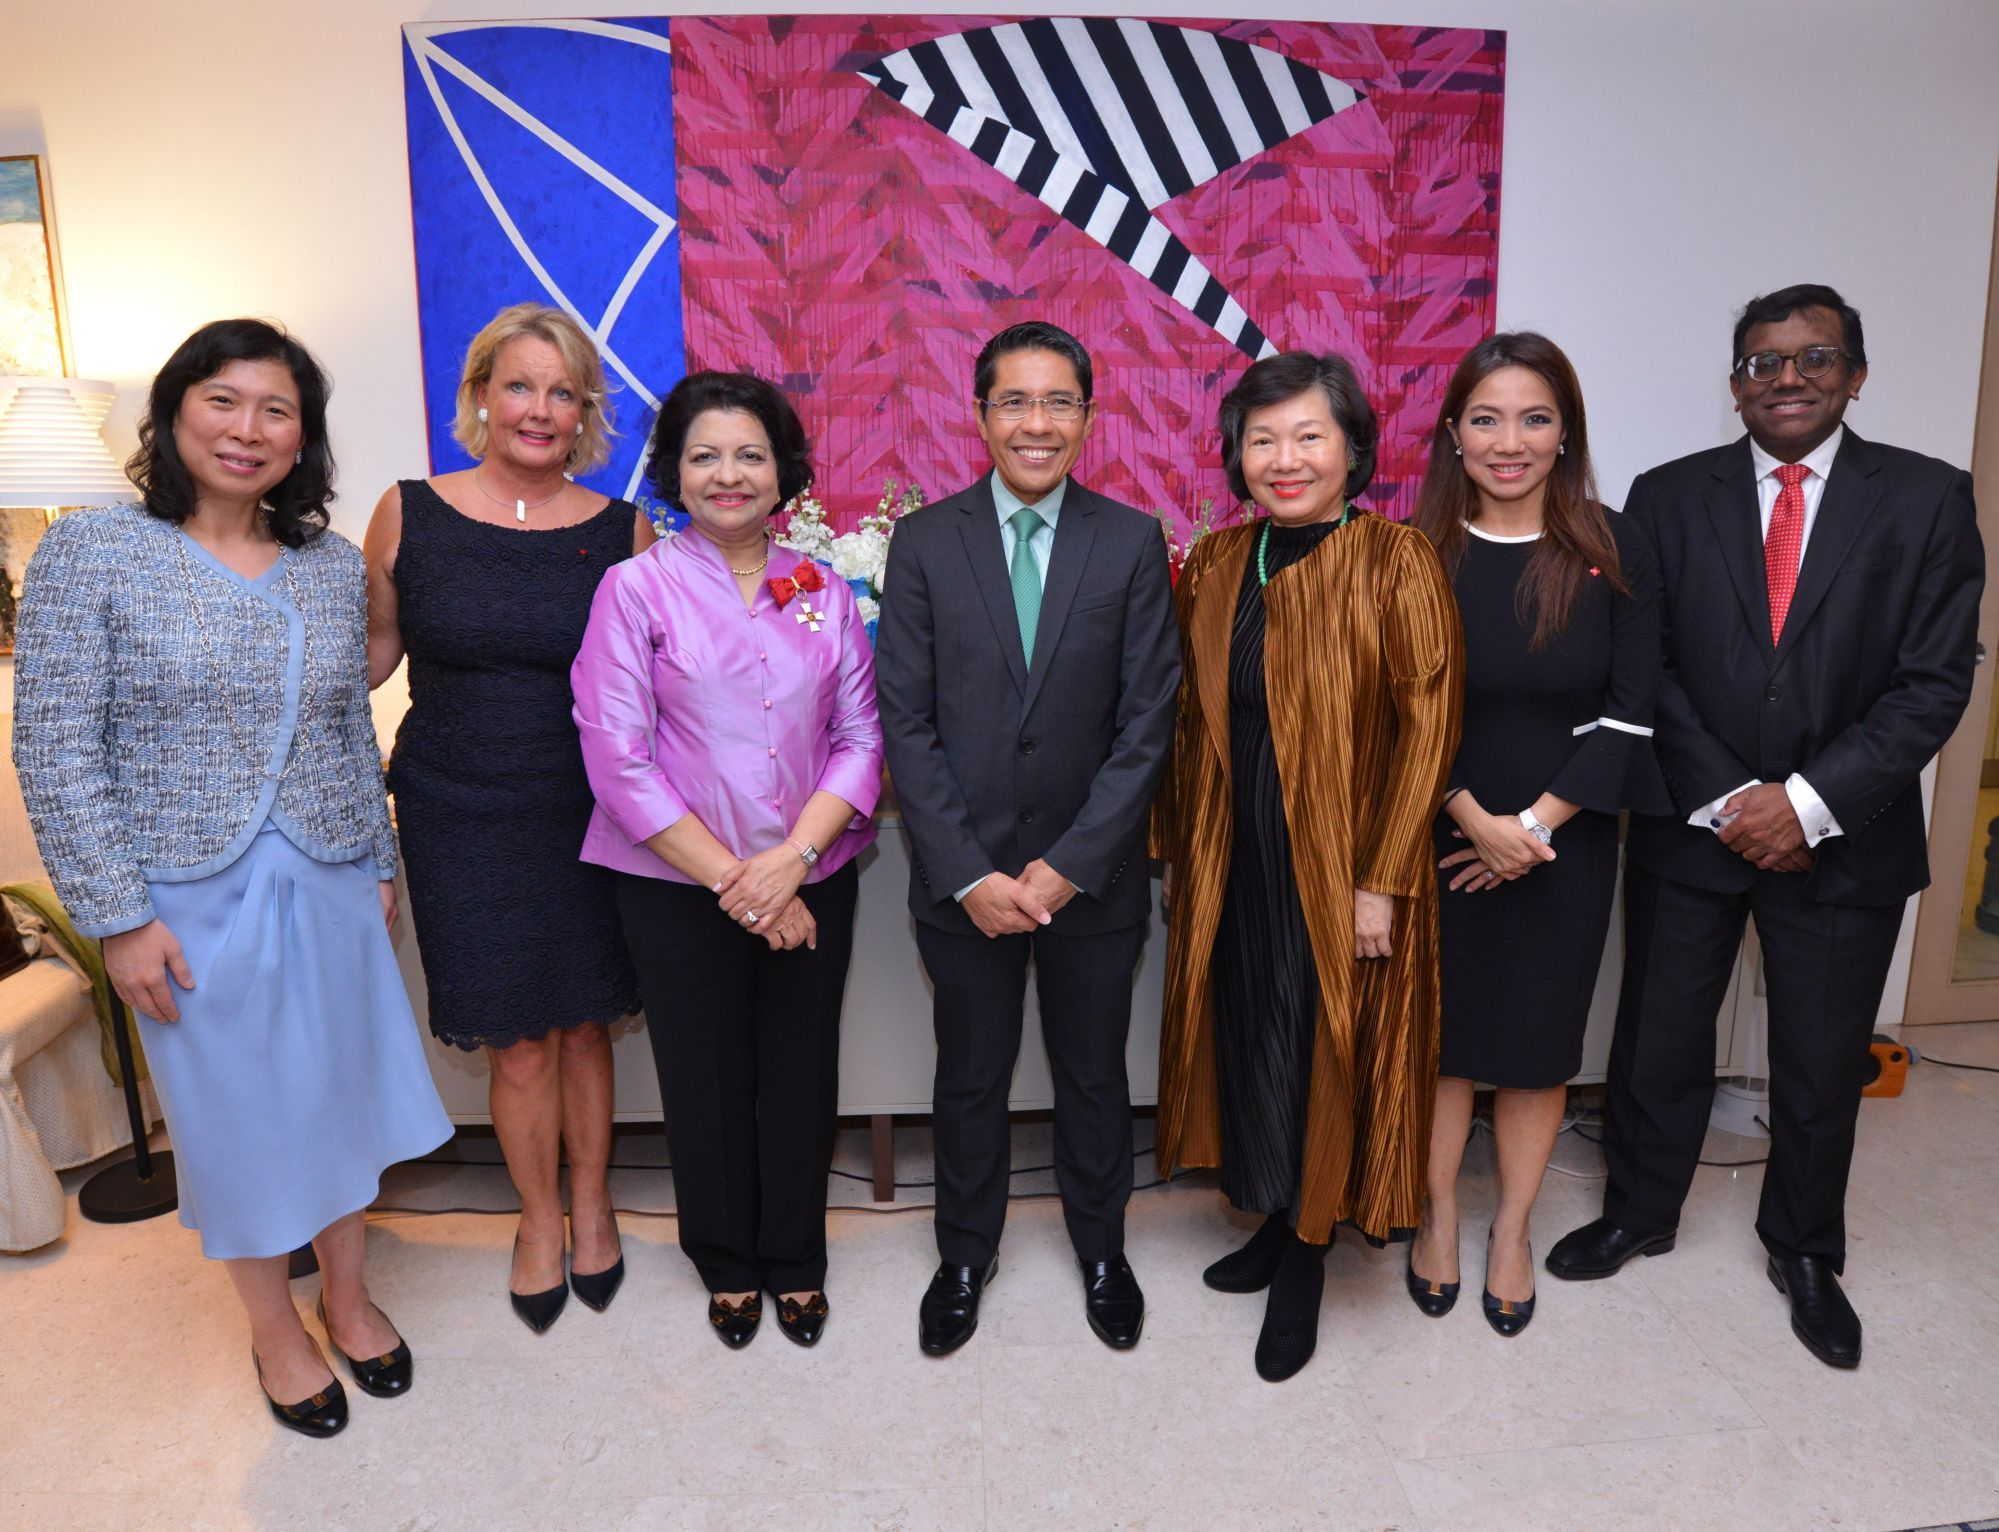 Michelle Liem, Paula Parviainen, Jaya Mohideen, Mohamed Maliki Bin Osman, Yu-Foo Yee Shoon, Tan Su Shan, Vinodh Coomaraswamy